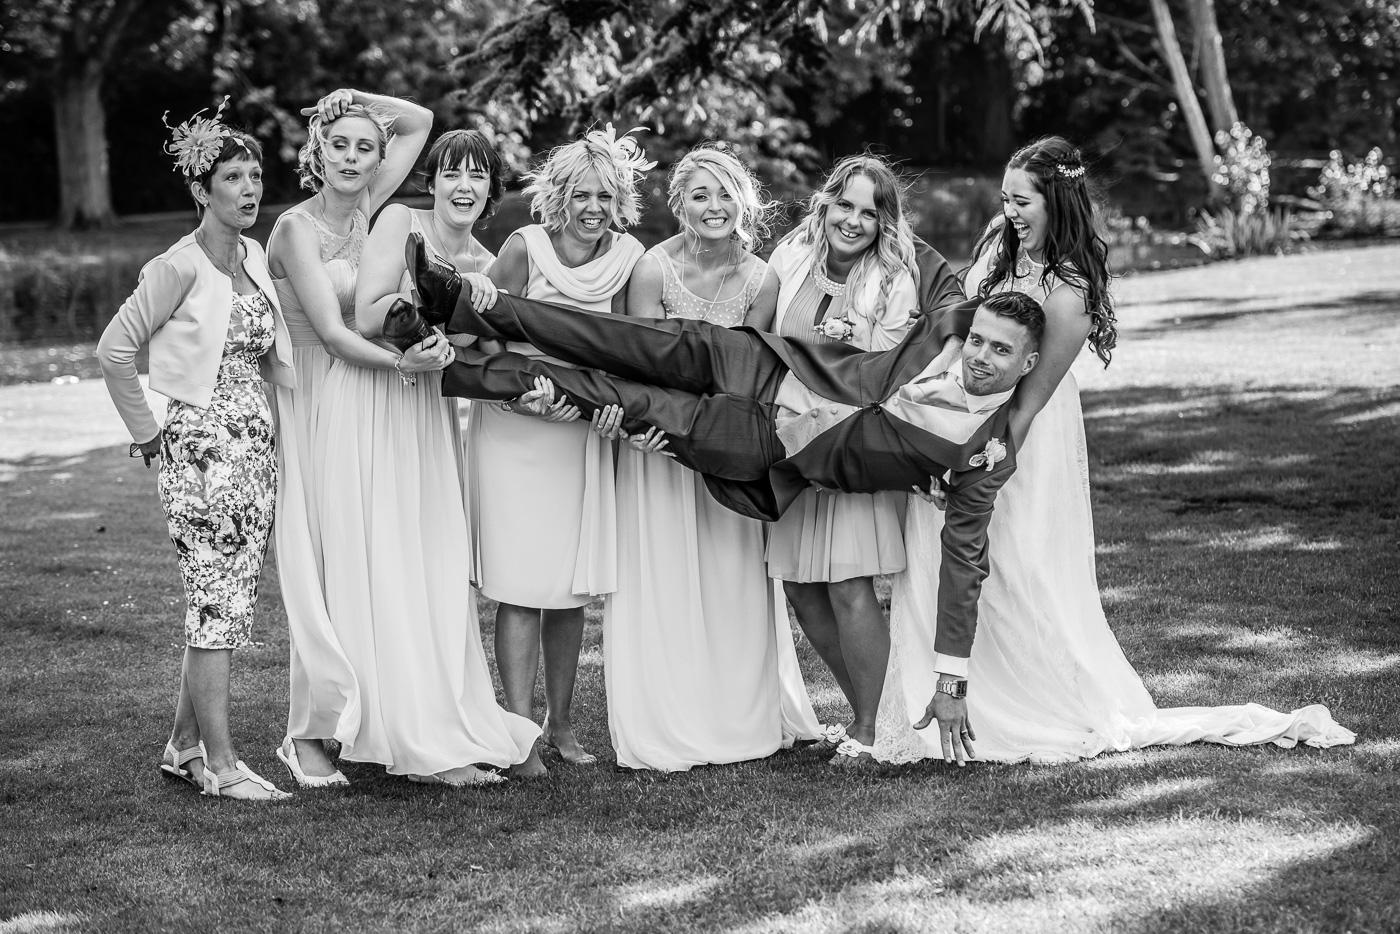 Affordable Wedding Photographer - https://bigdayproductions.co.uk